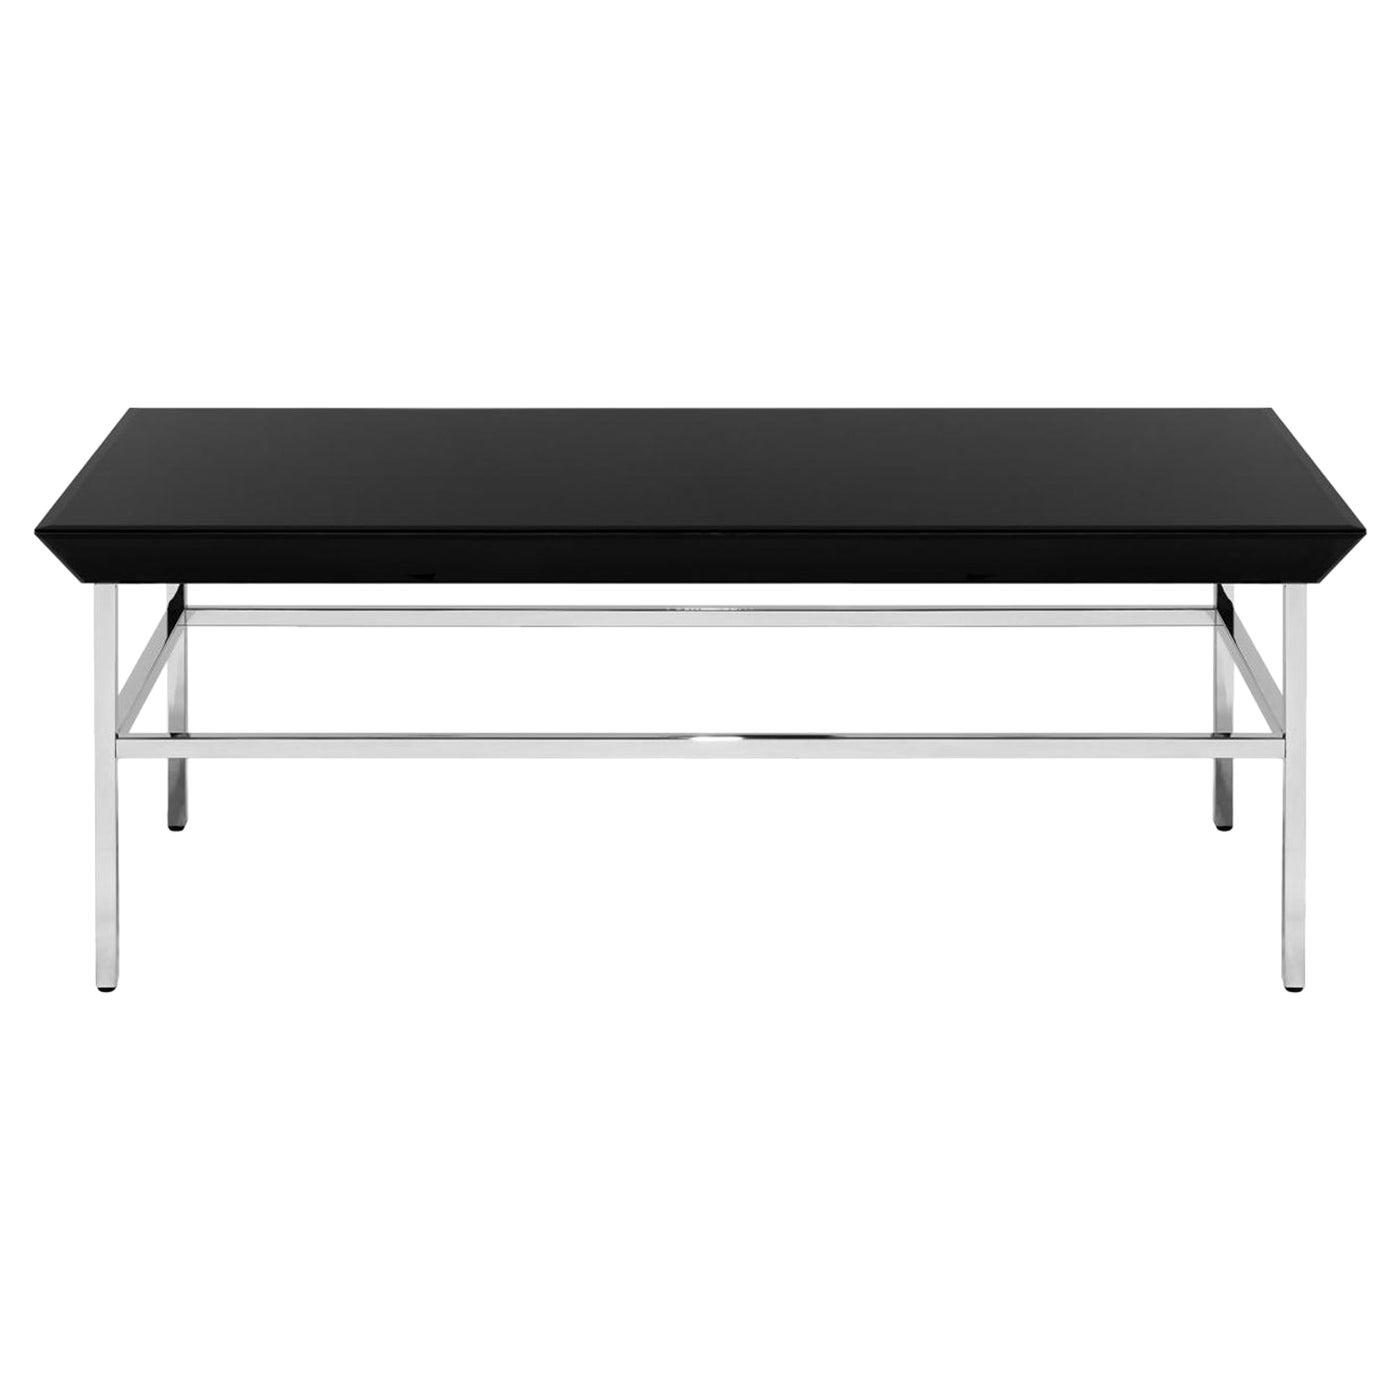 Black Glassy Coffee Table